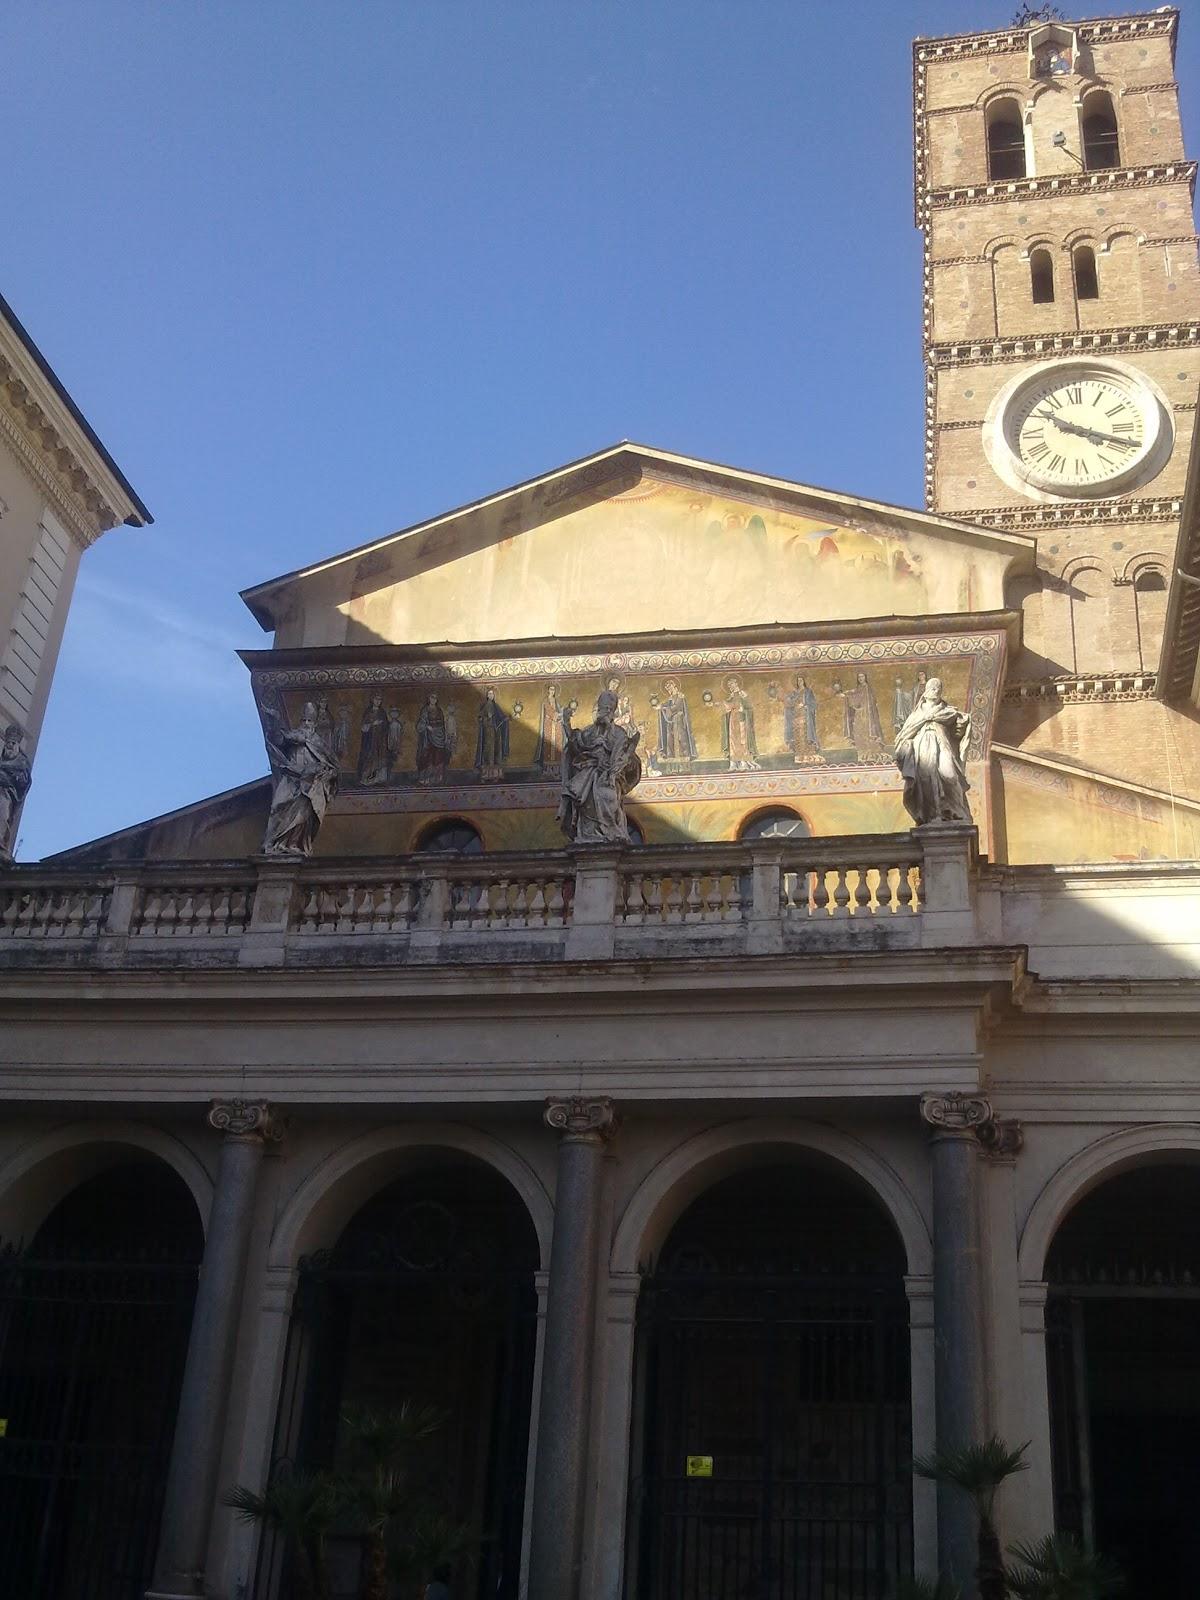 LE CHIESE: I MOSAICI MEDIEVALI DI SANTA MARIA IN TRASTEVERE